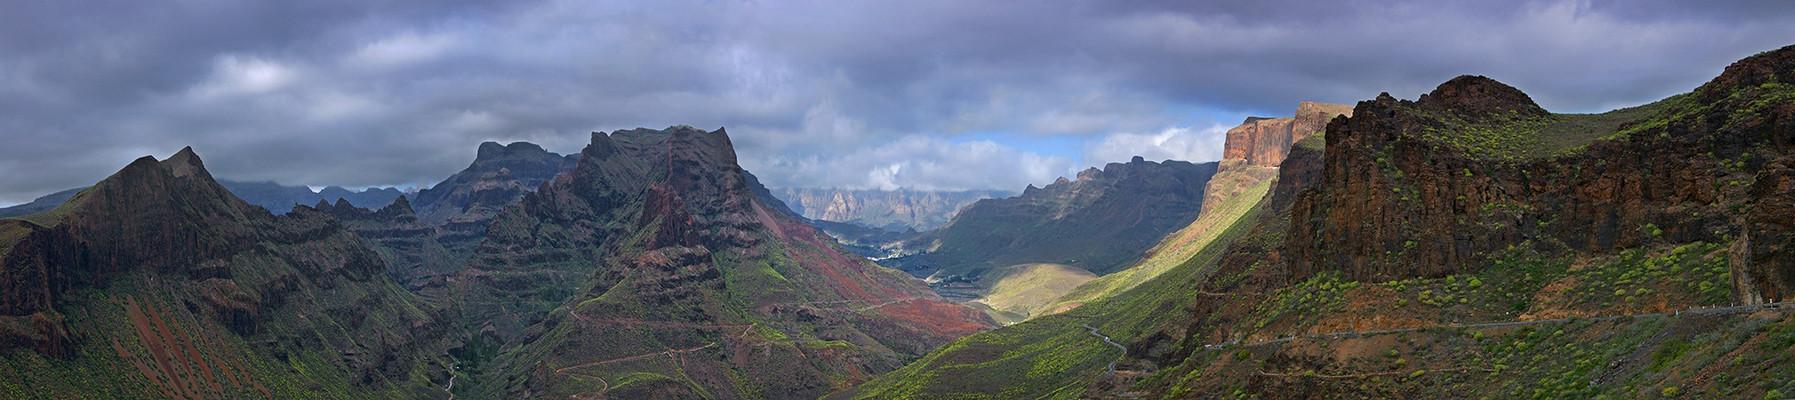 Canyon Fataga